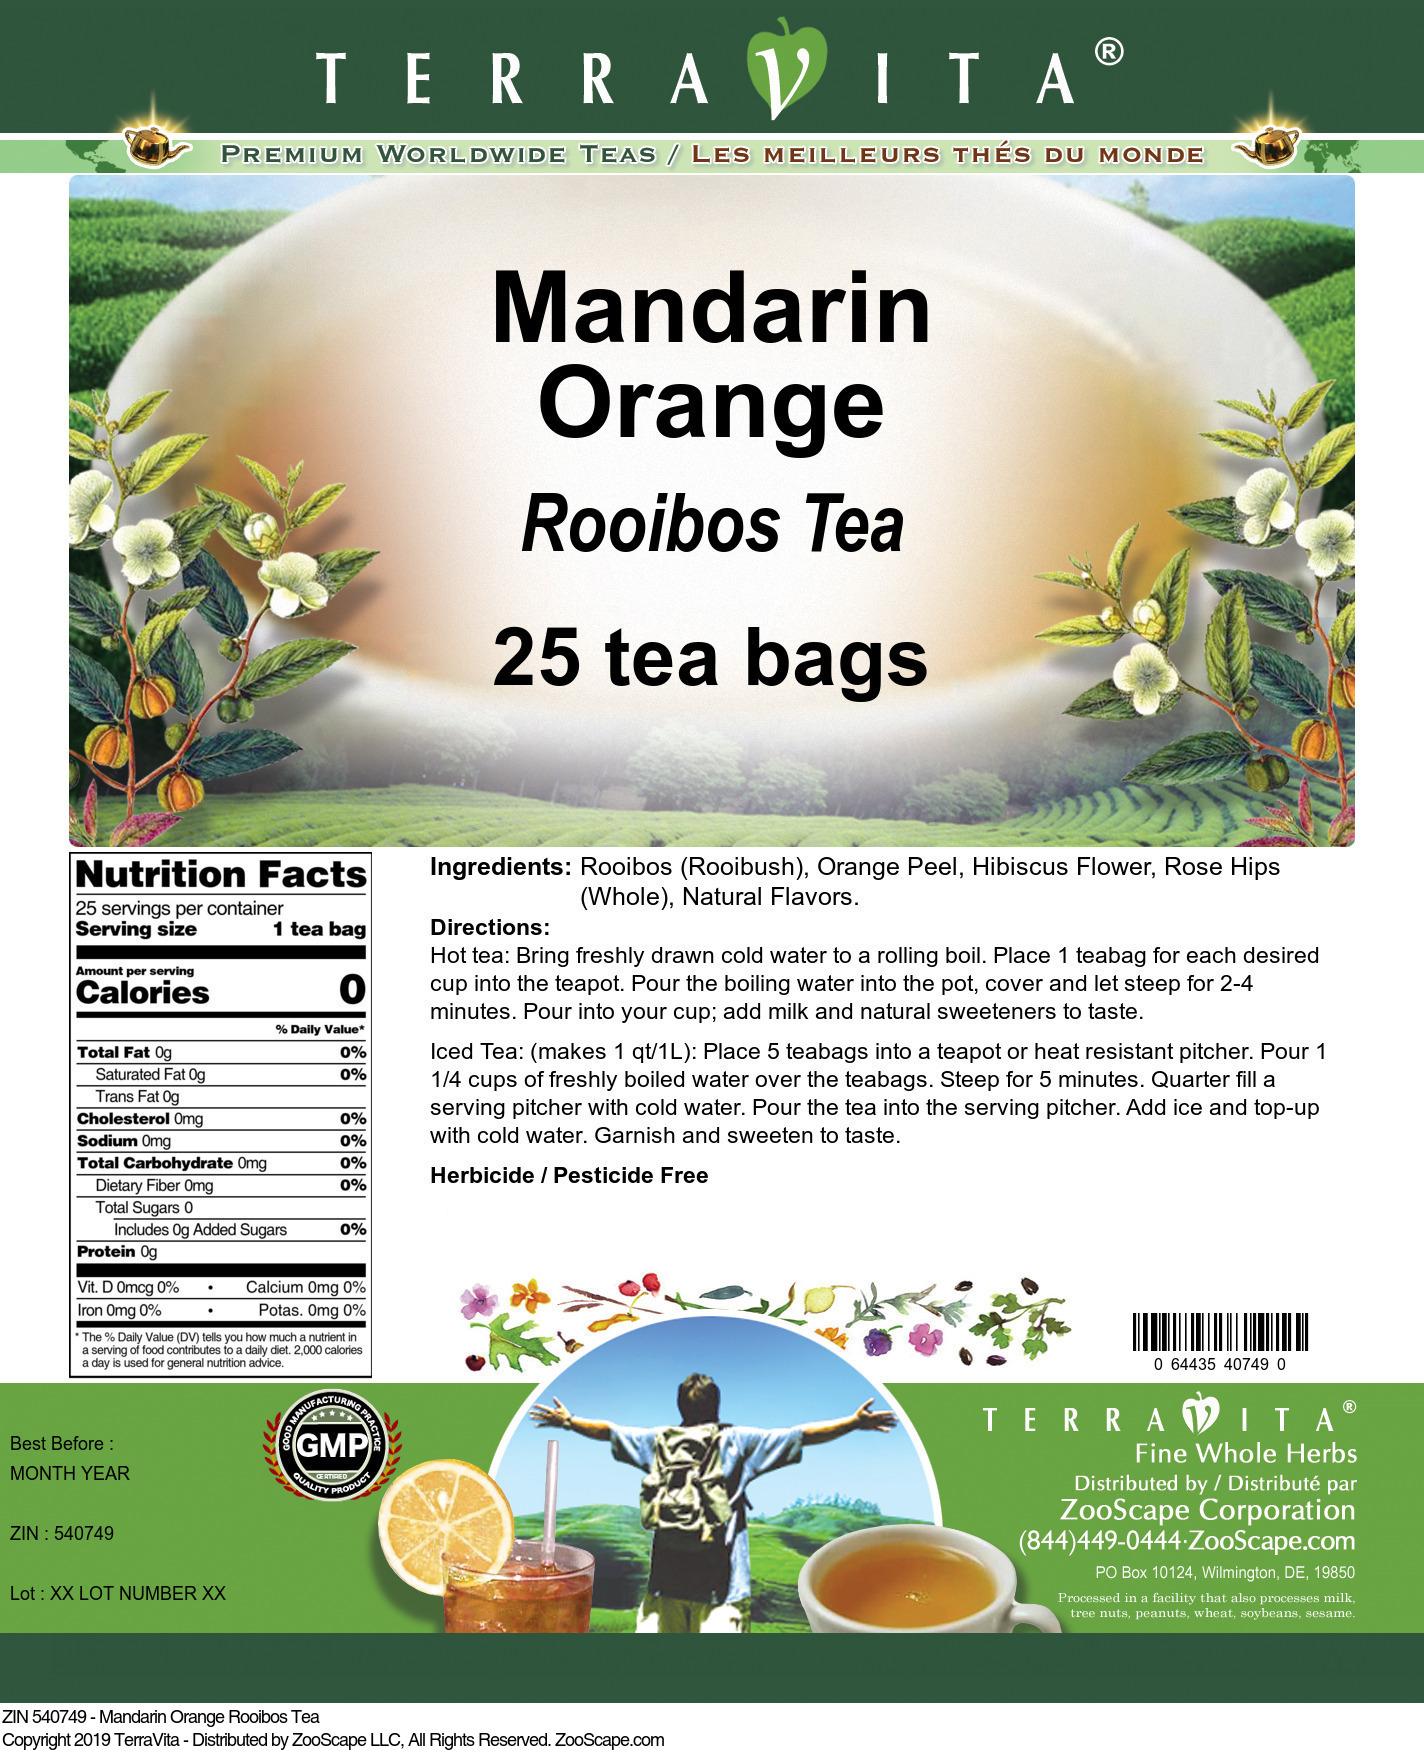 Mandarin Orange Rooibos Tea